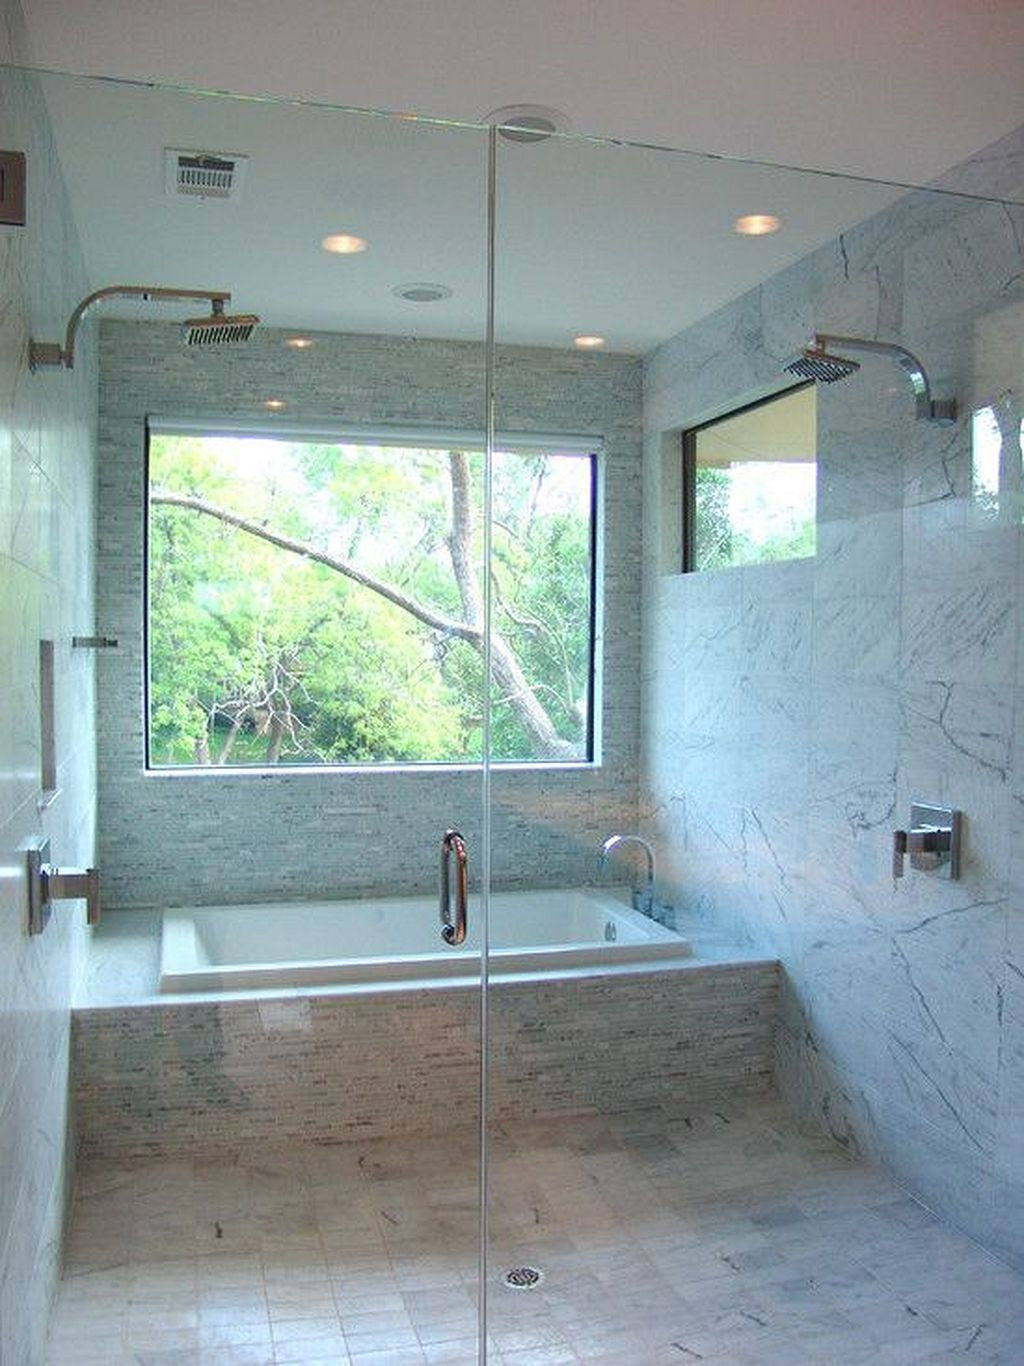 Tiny Bathroom Tub Shower Combo Remodeling Ideas 32 | Bathroom tub ...